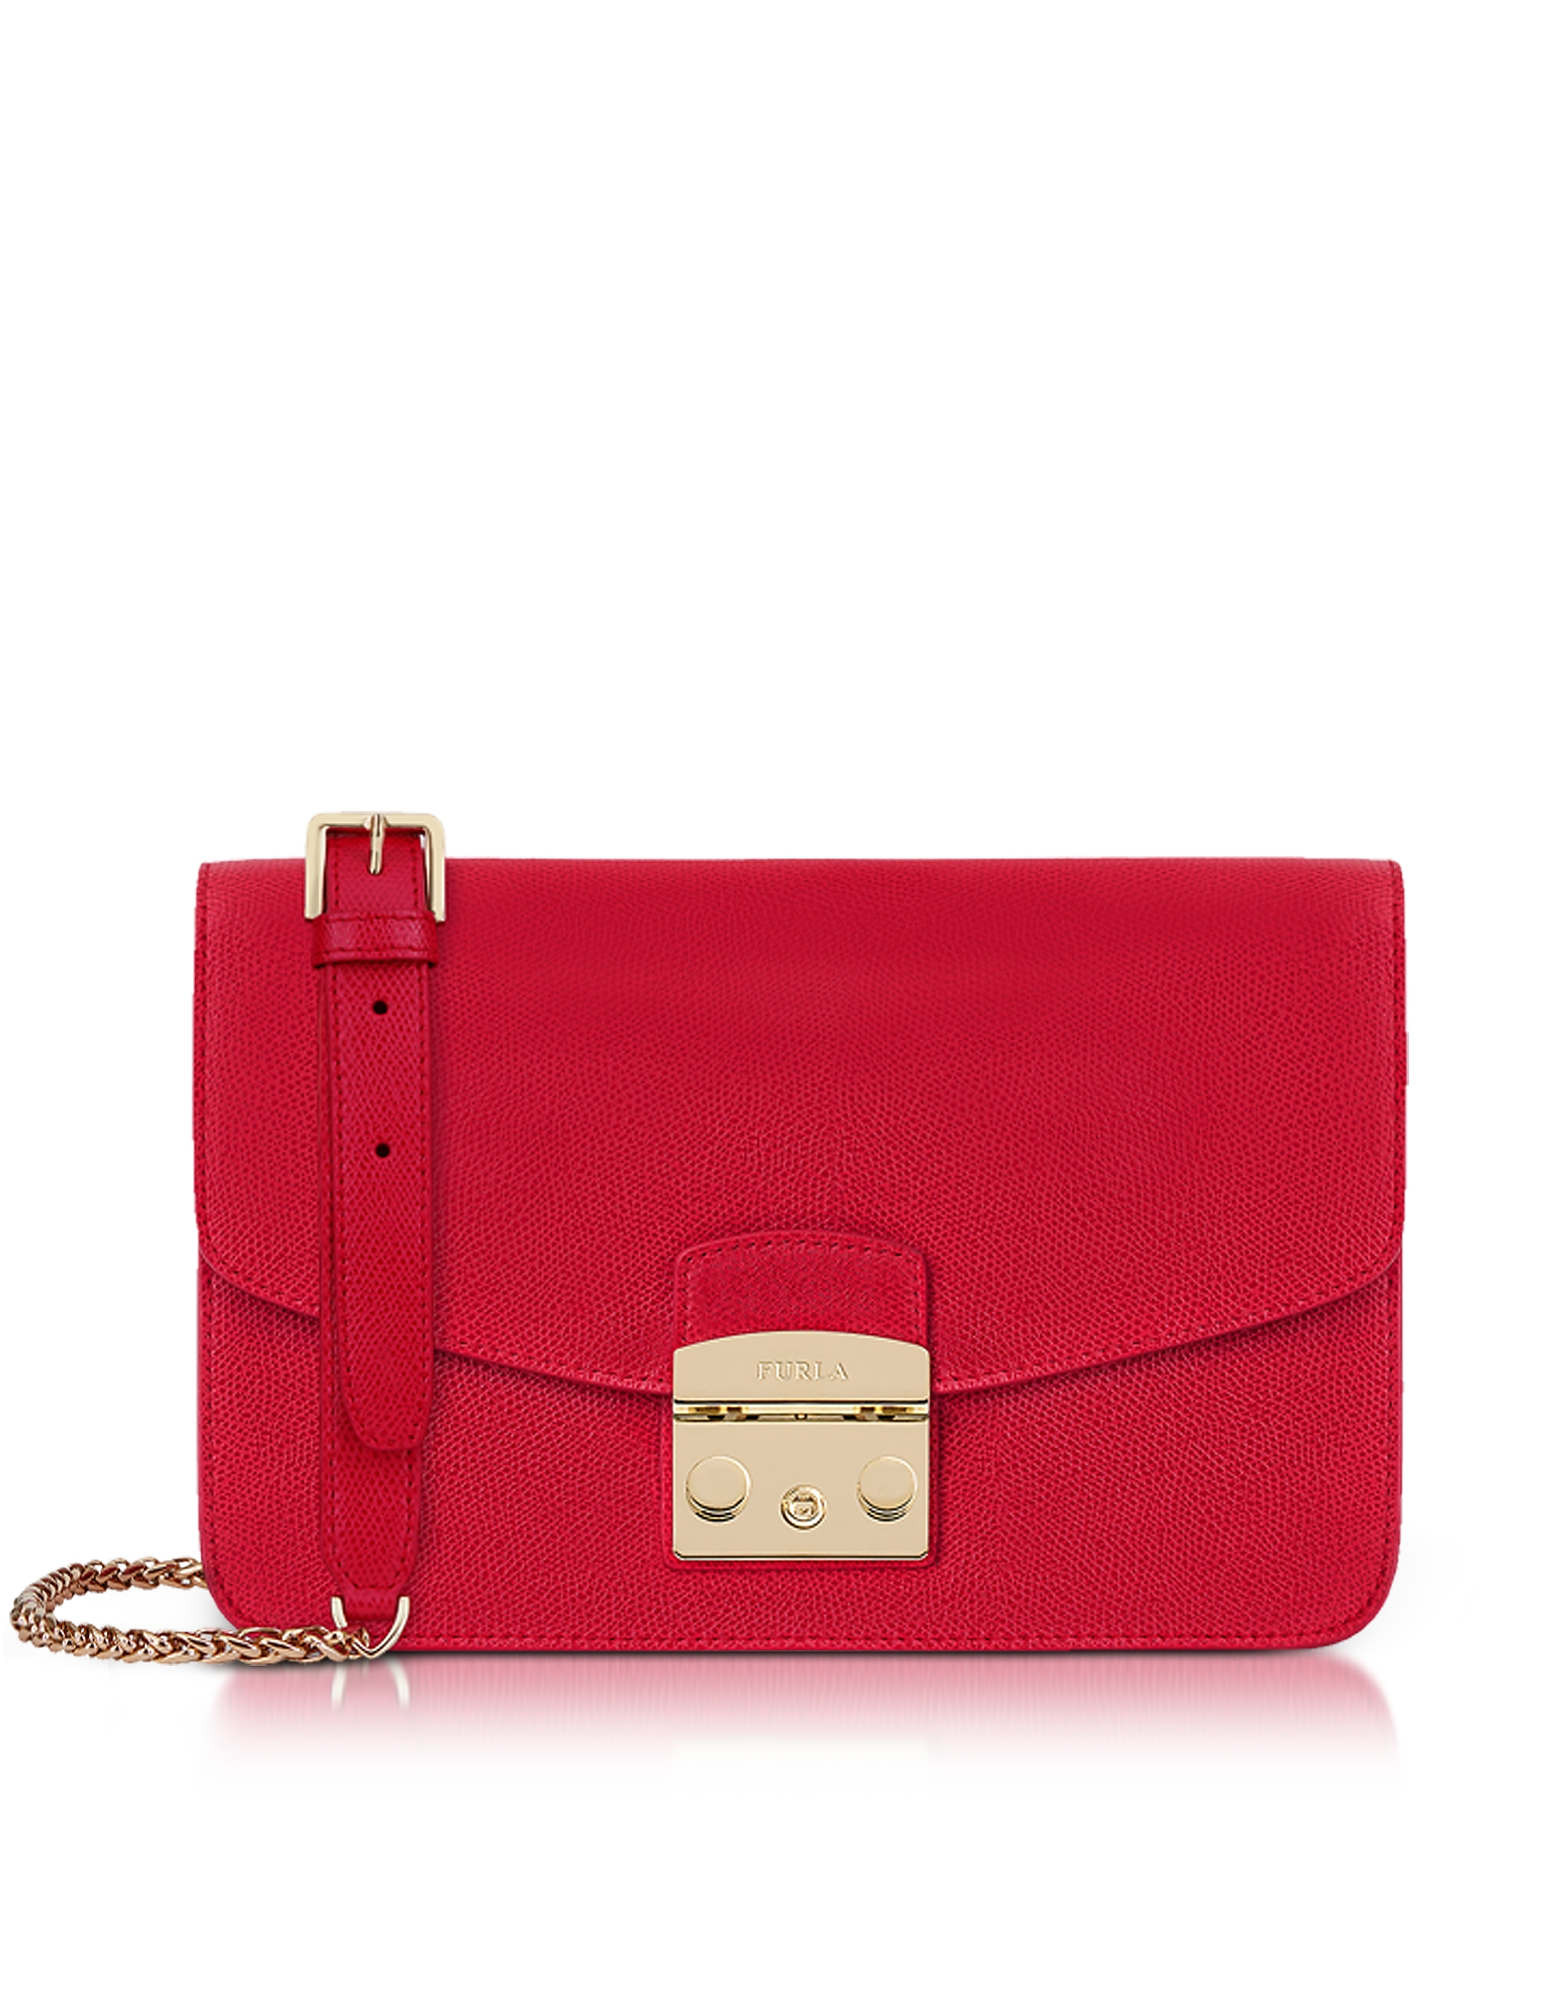 Image of Furla Designer Handbags, Ruby Red Lizard Printed Leather Metropolis Small Shoulder Bag